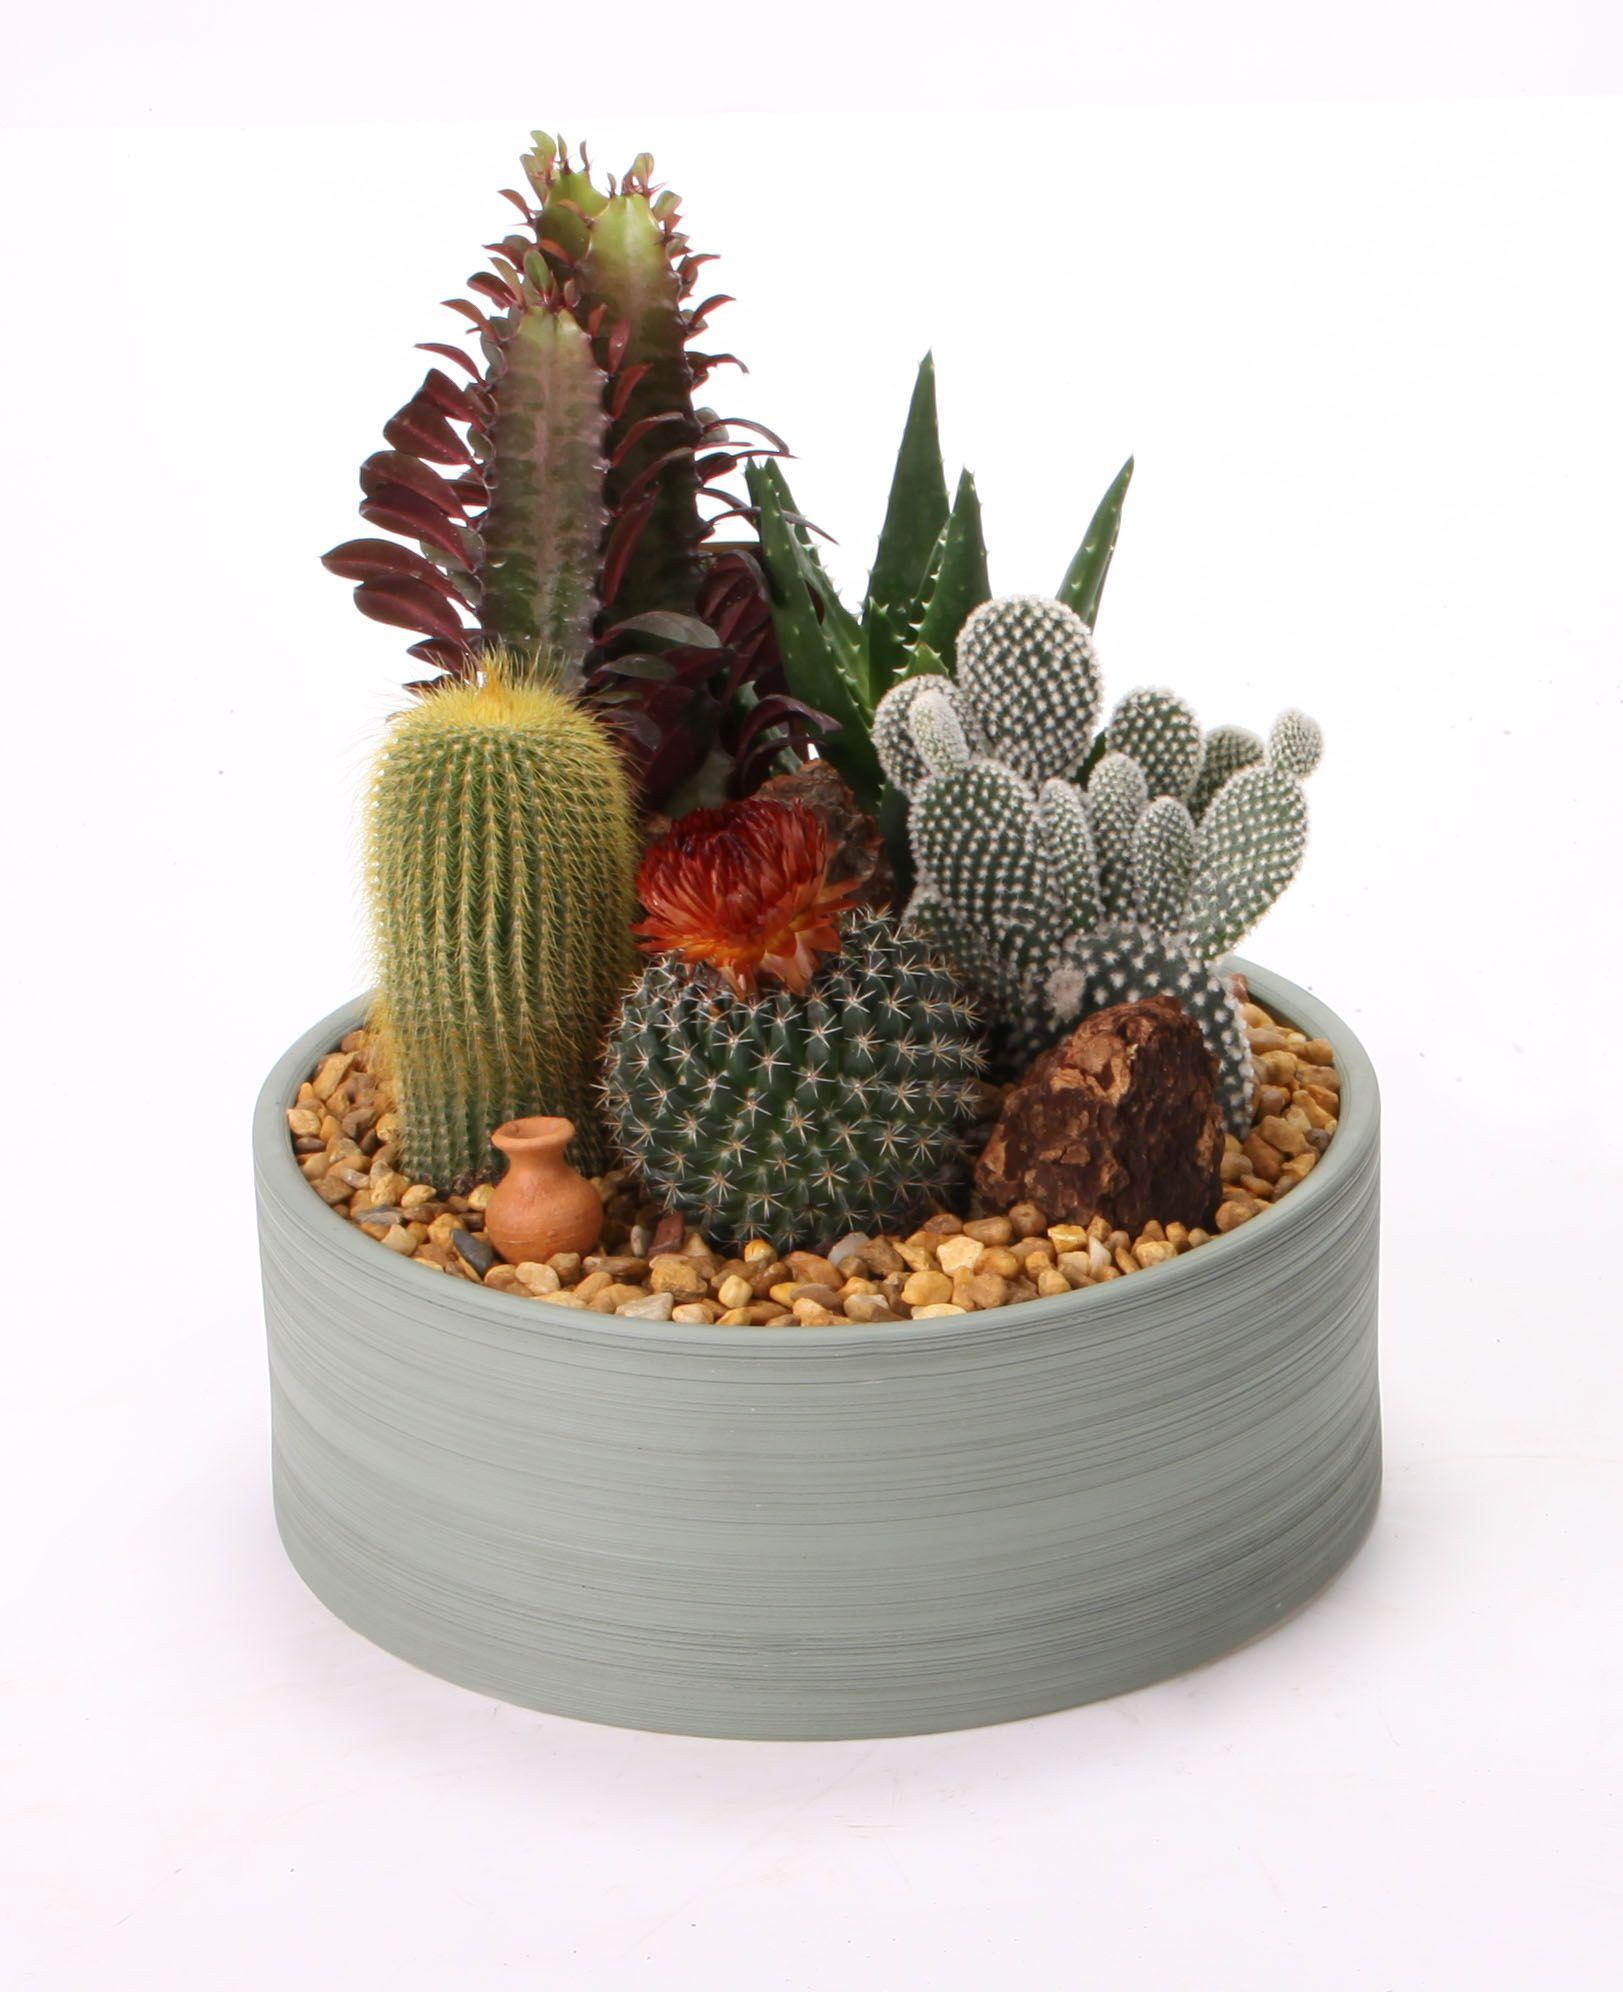 36 Cactus Garden Design Ideas : Landscaping with Cactus ...